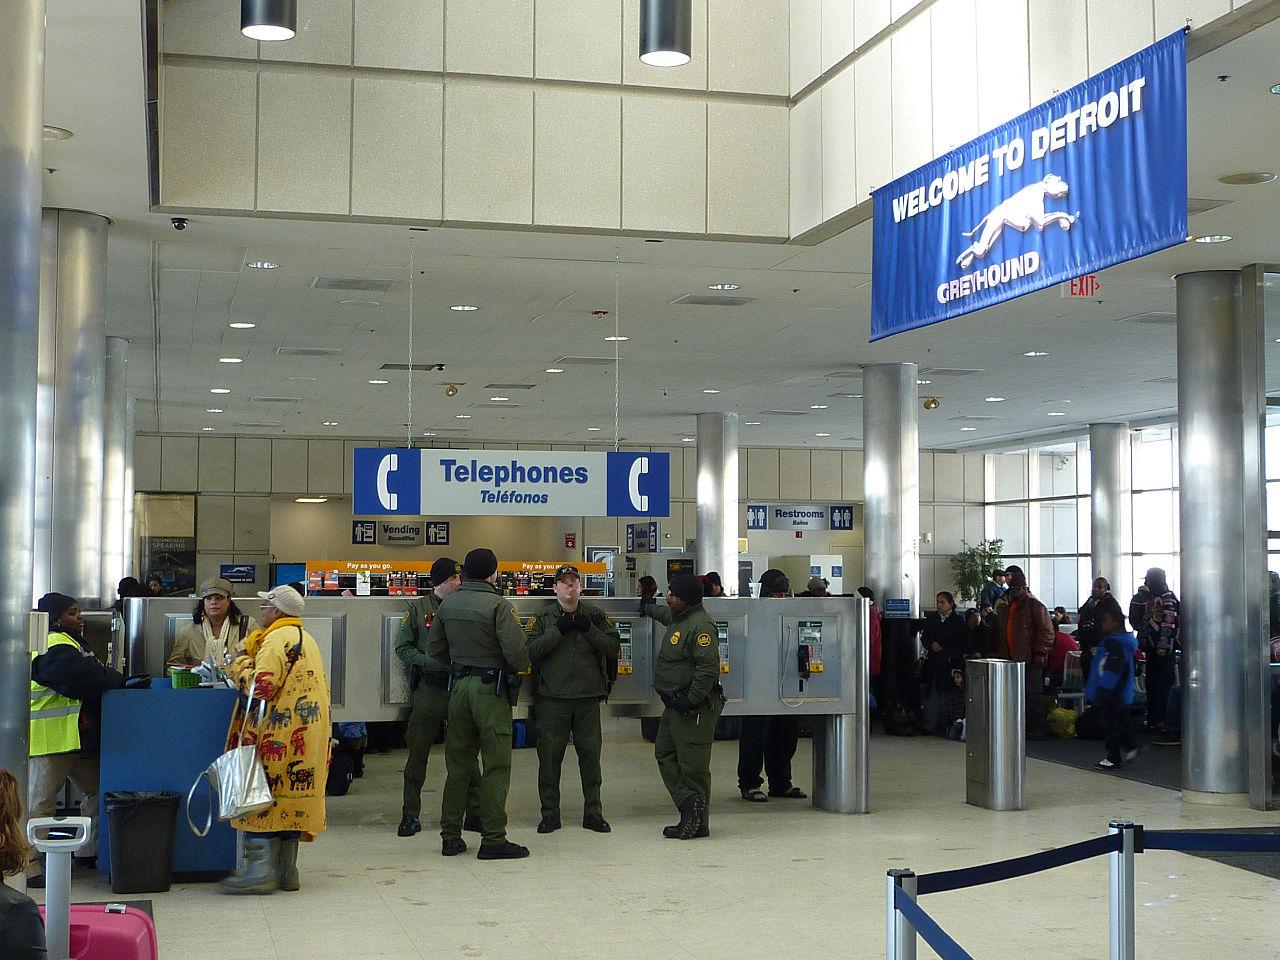 Us Border Patrol Pay Chart: Detroit - Inside Greyhound Bus Station - P1080197.JPG ,Chart